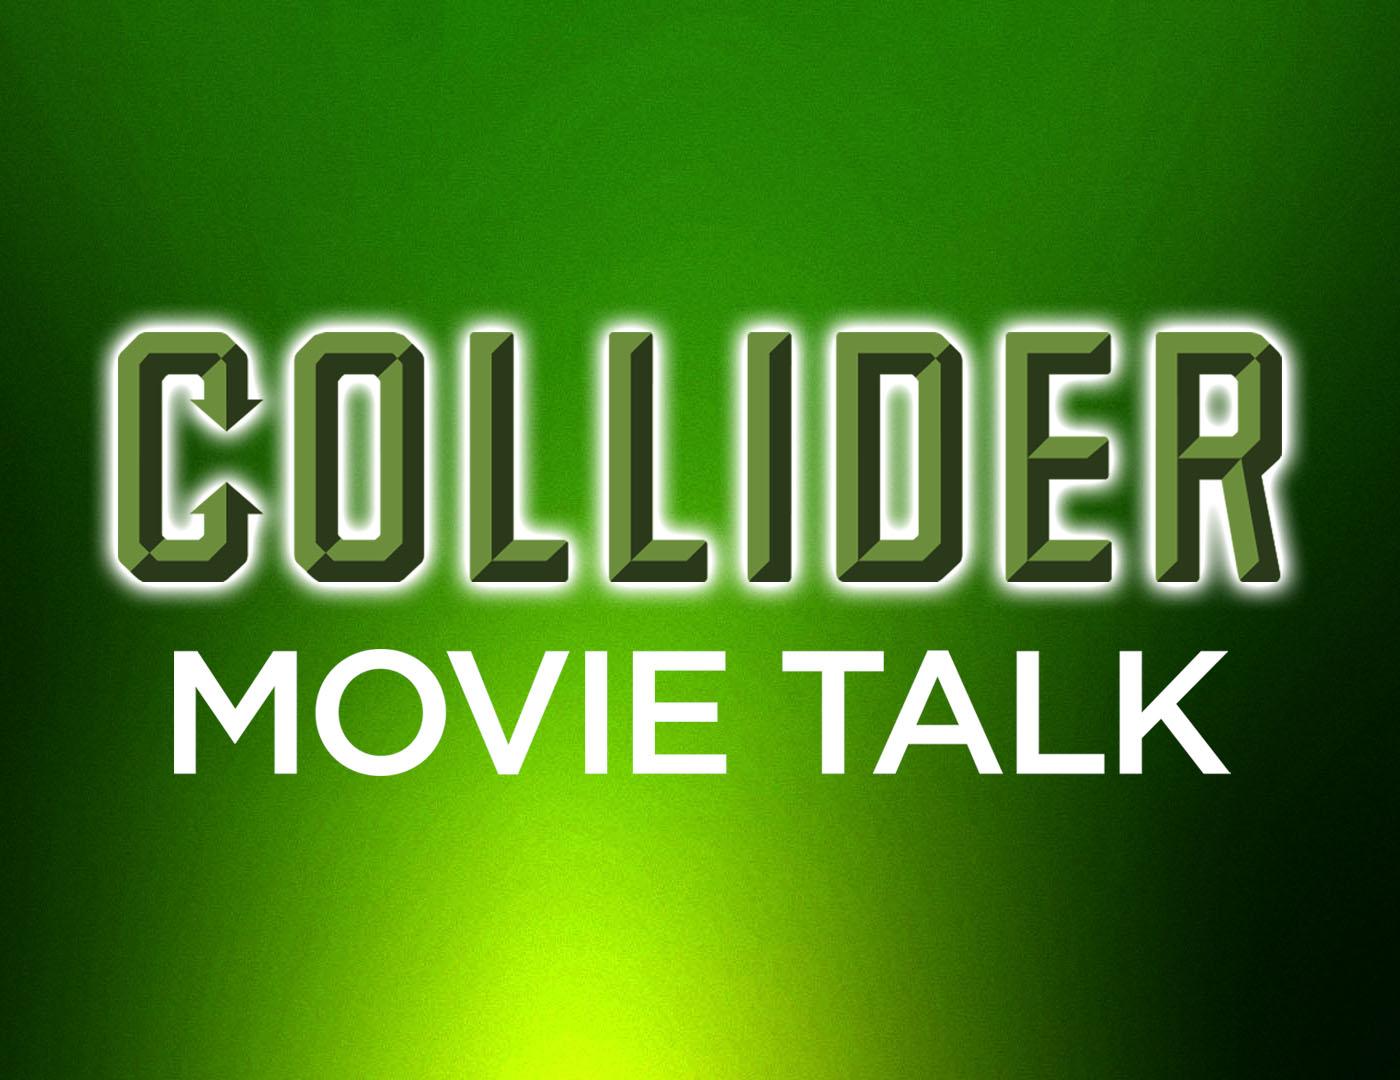 New Black Panther and Thor: Ragnarok Concept Art - Collider Movie Talk